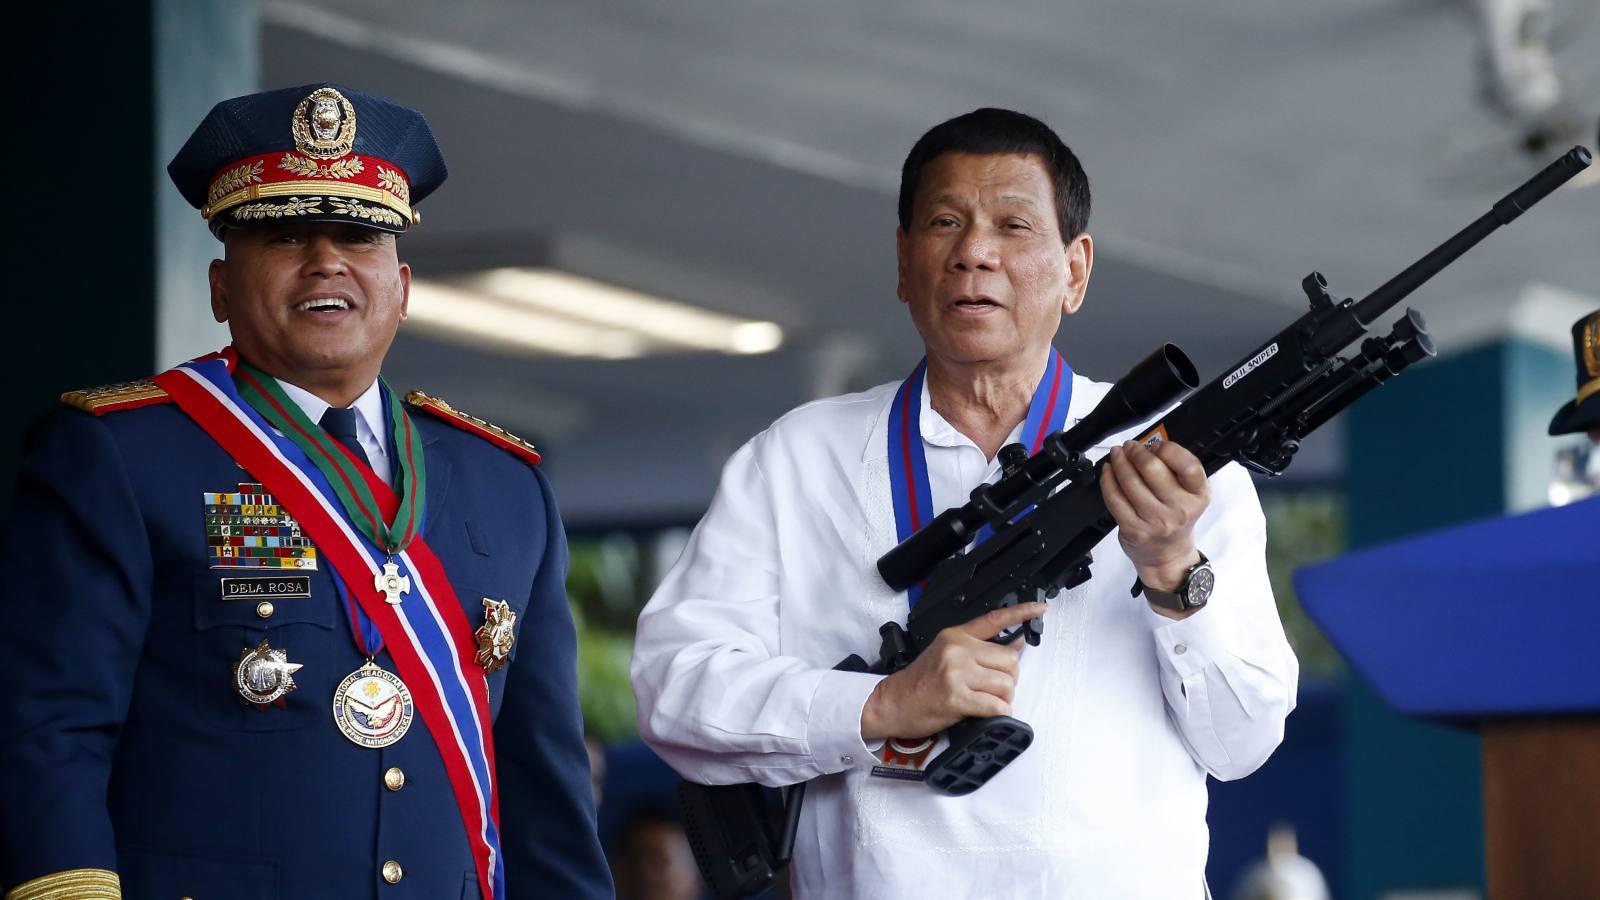 Duterte wants Philippines renamed 'Maharlika' - Nikkei Asian